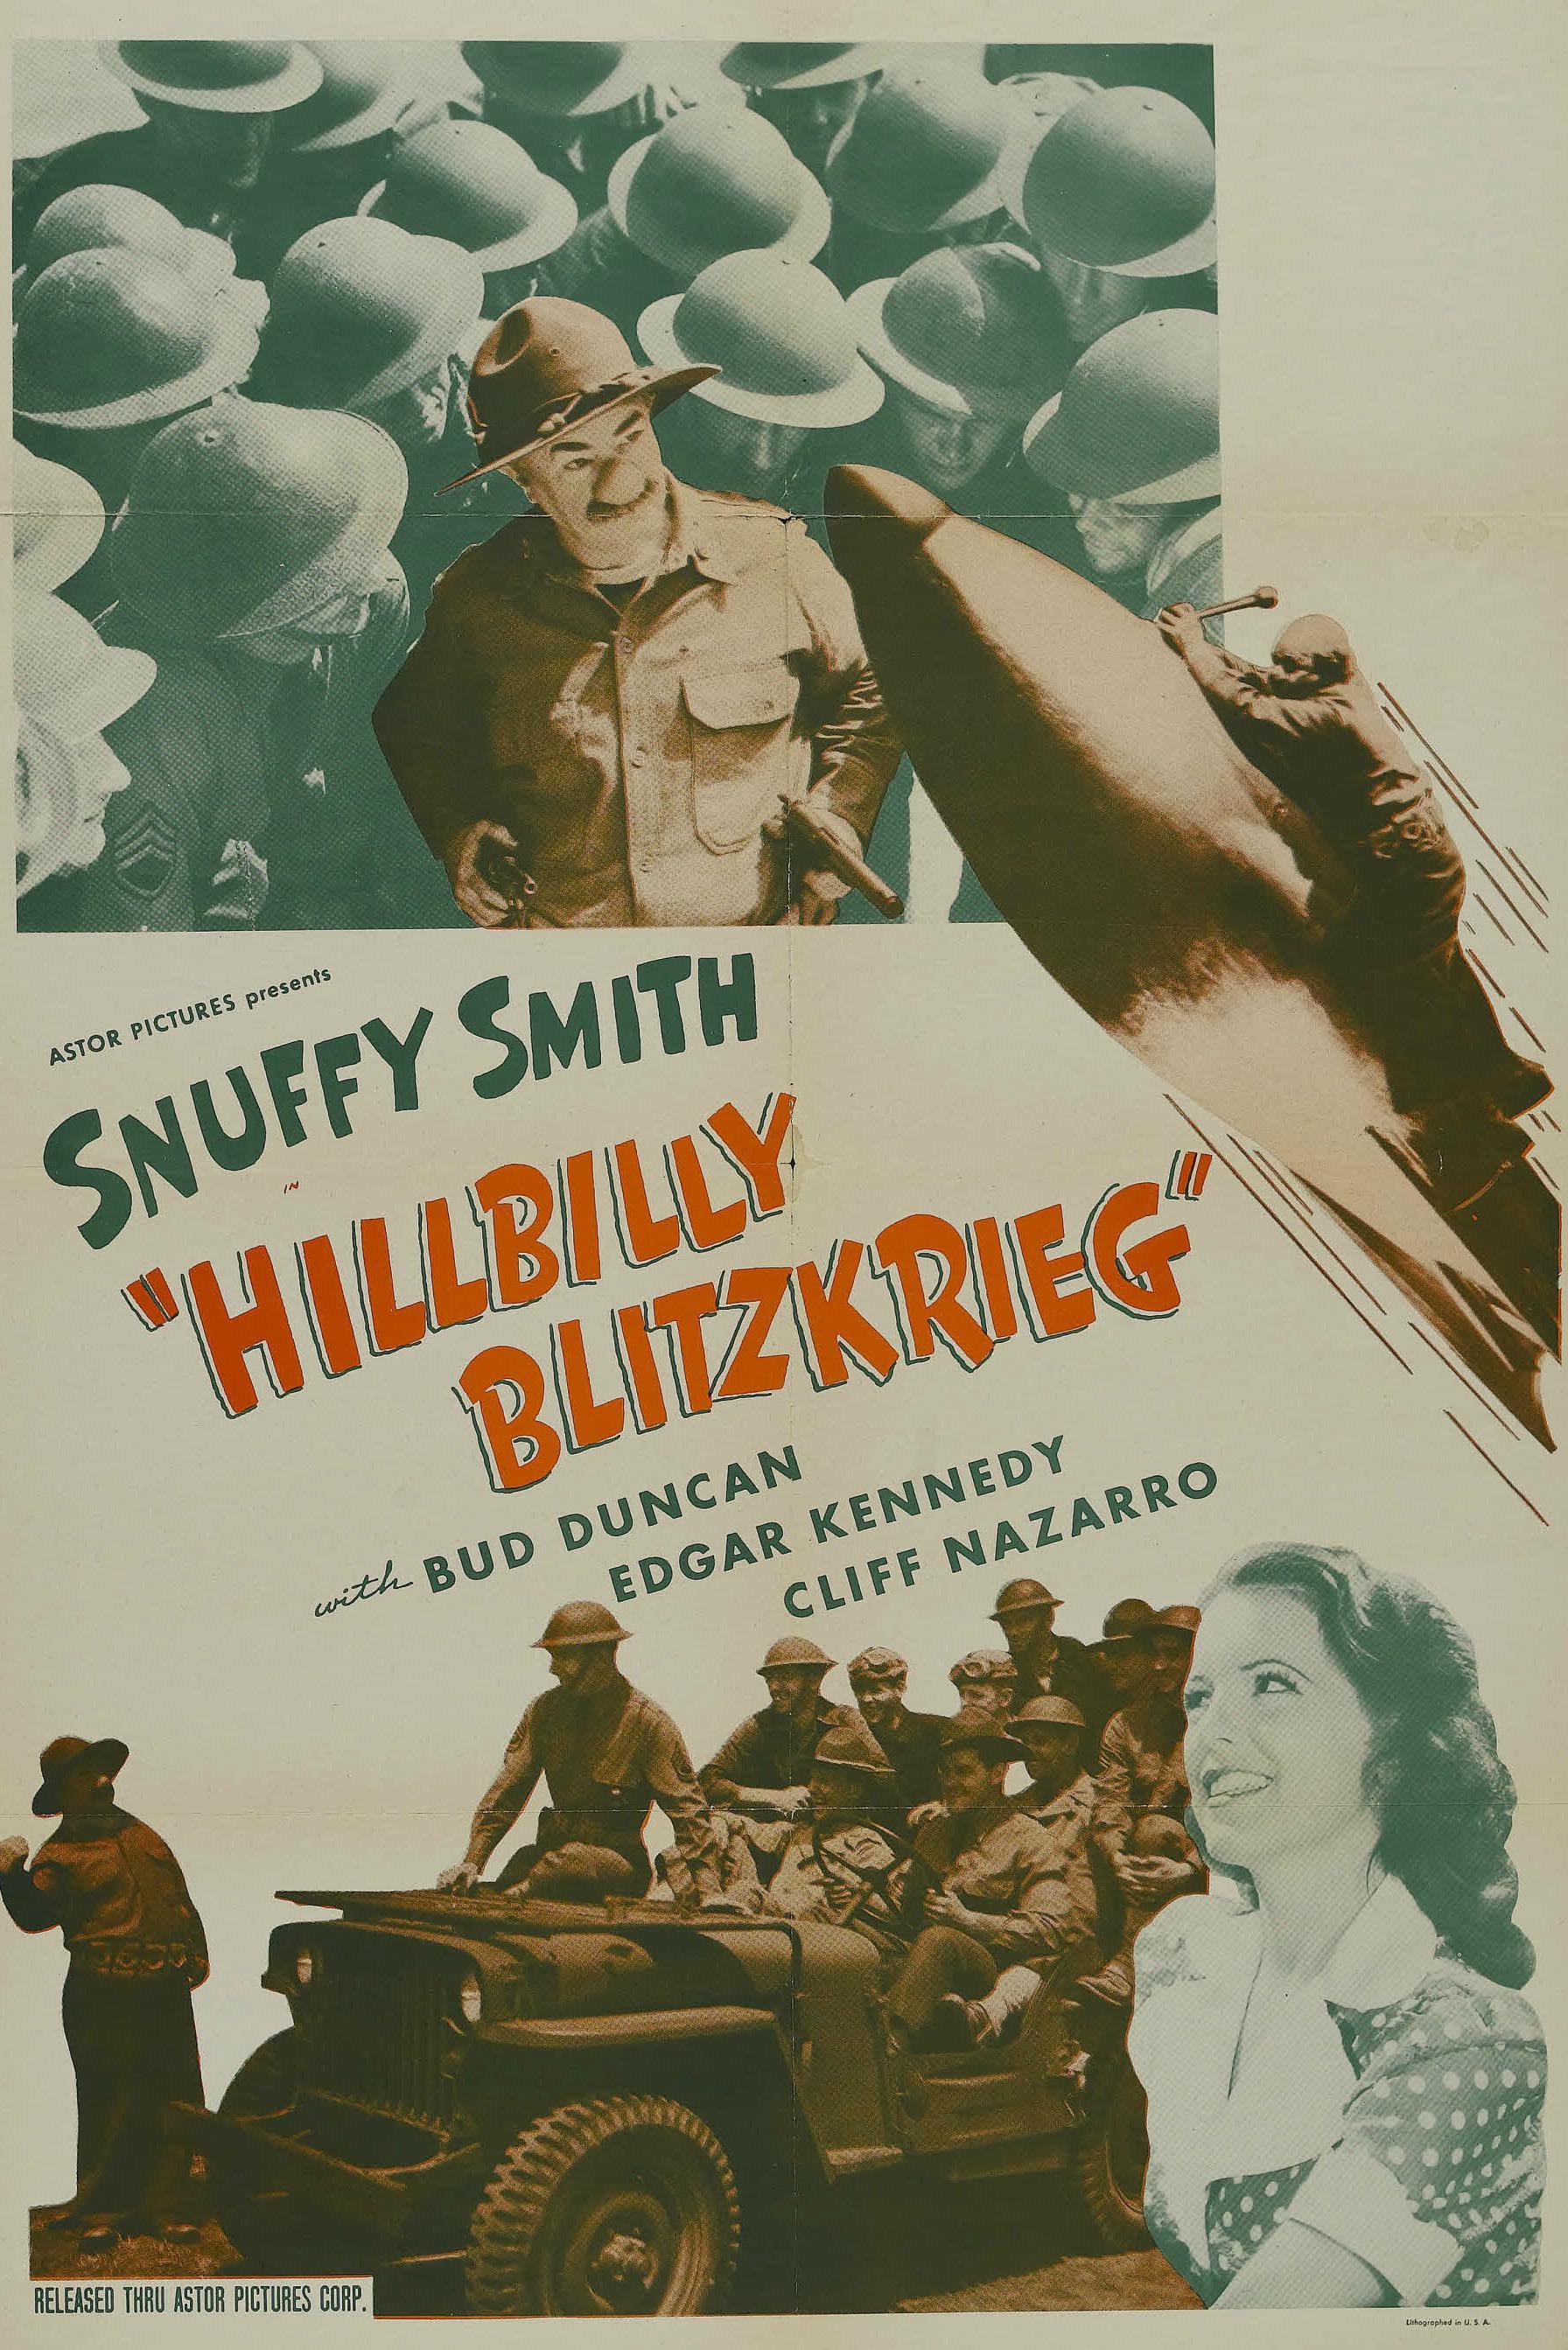 Hillbilly Blitzkrieg